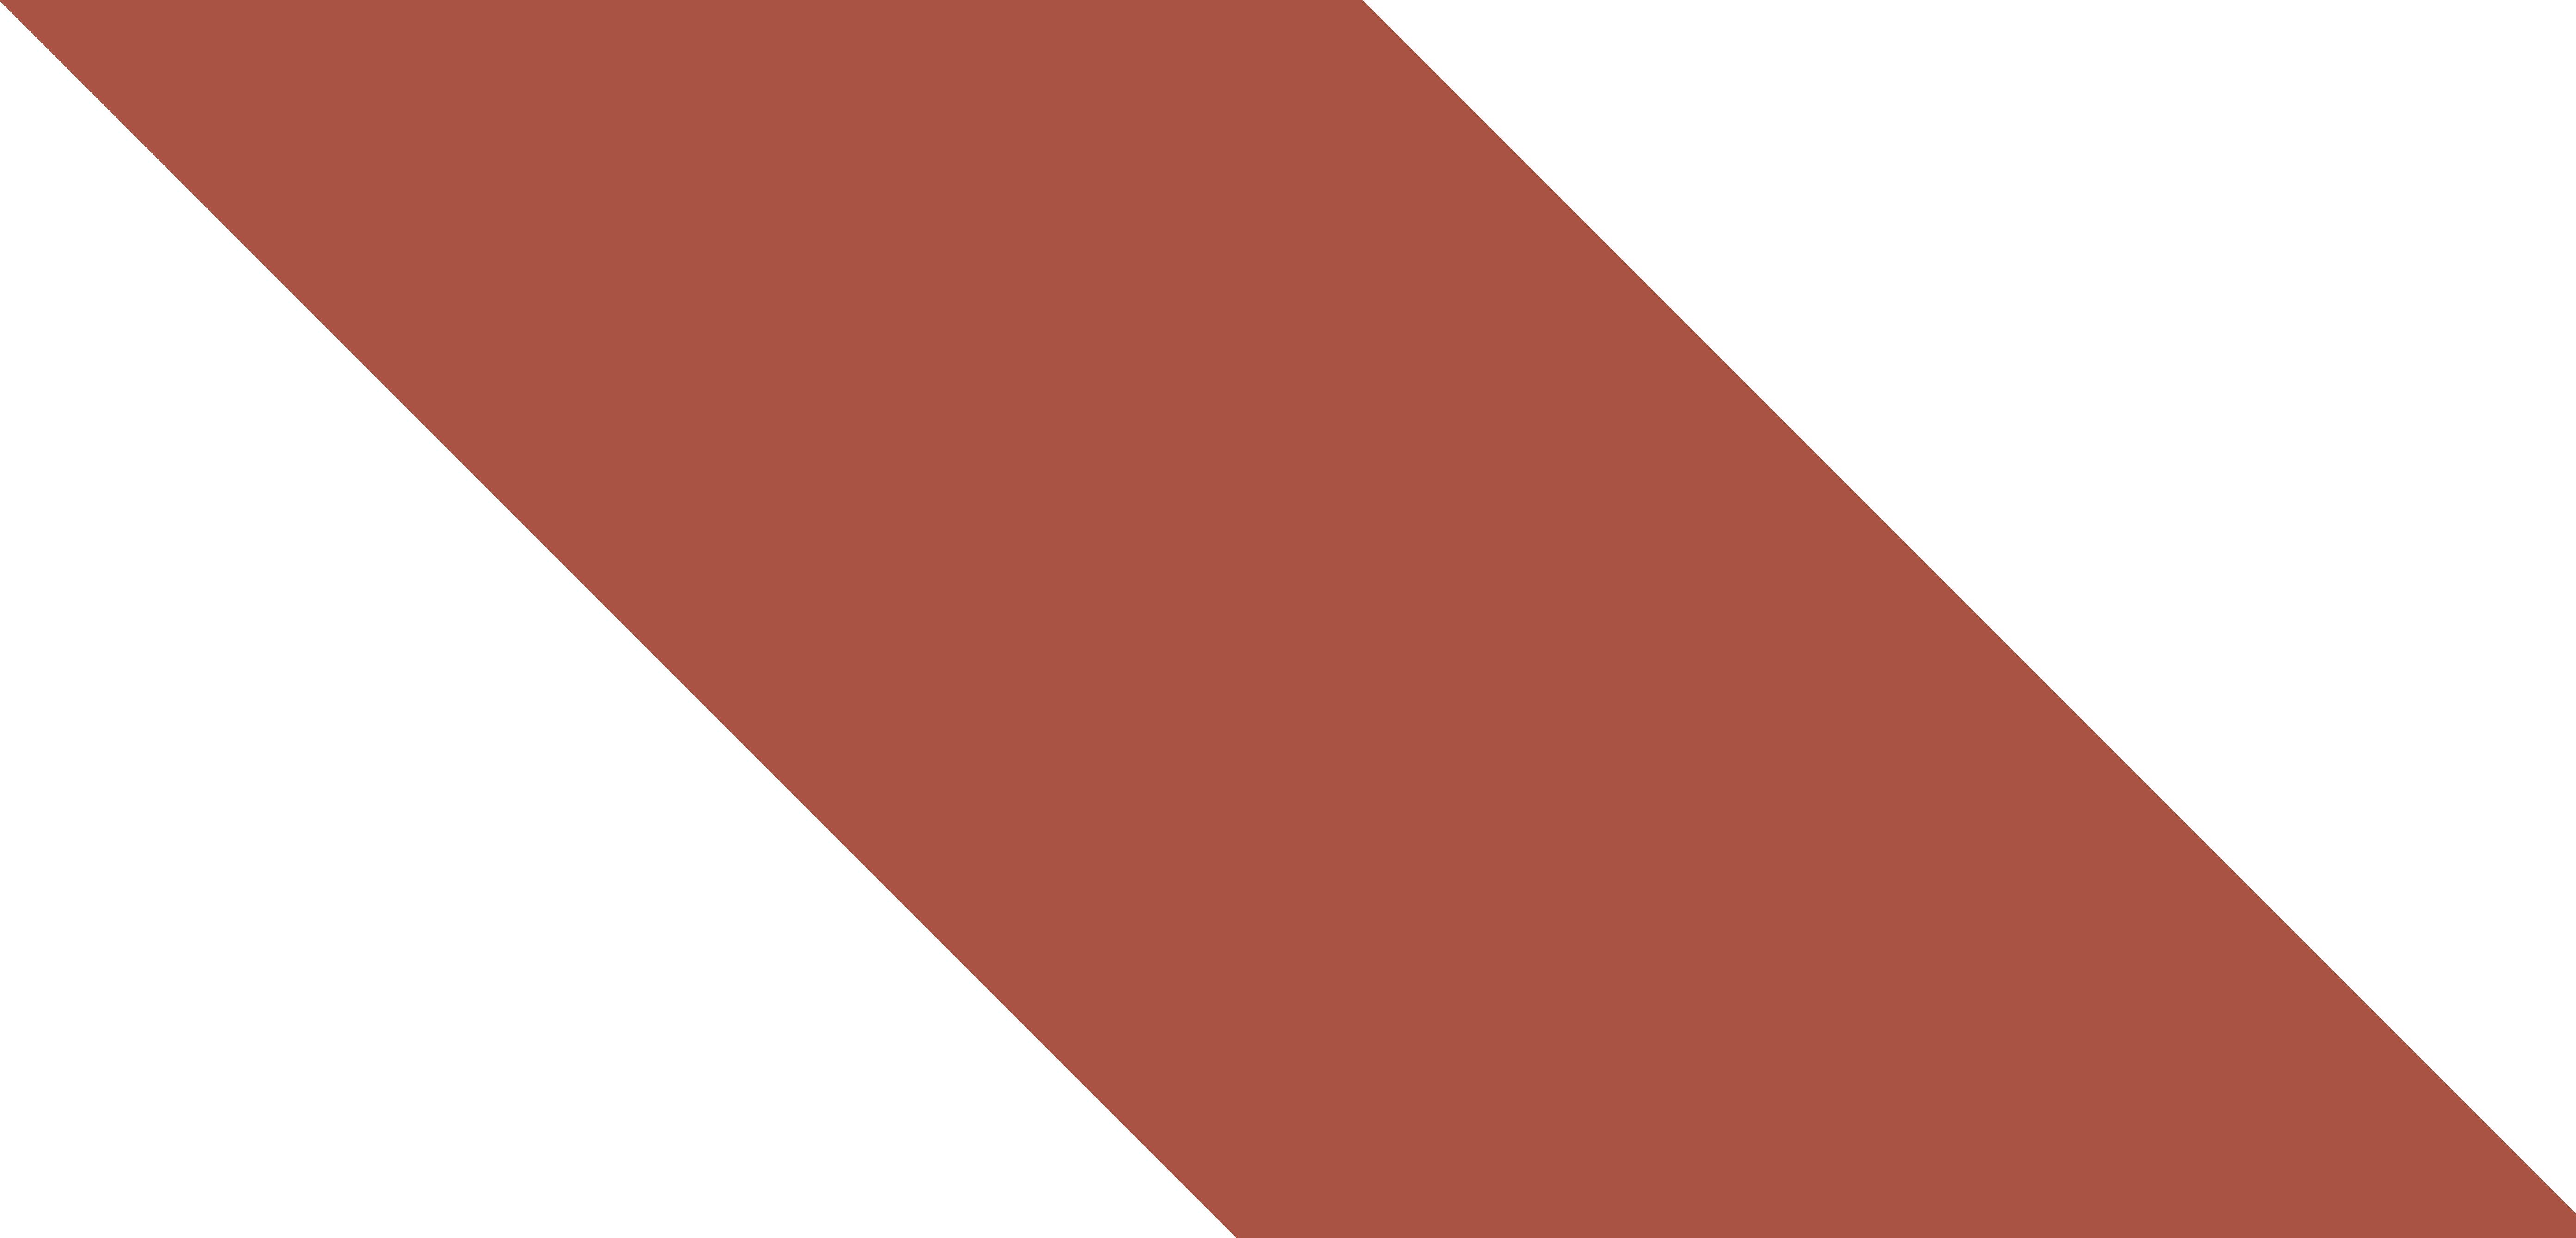 Red Stripe Animation